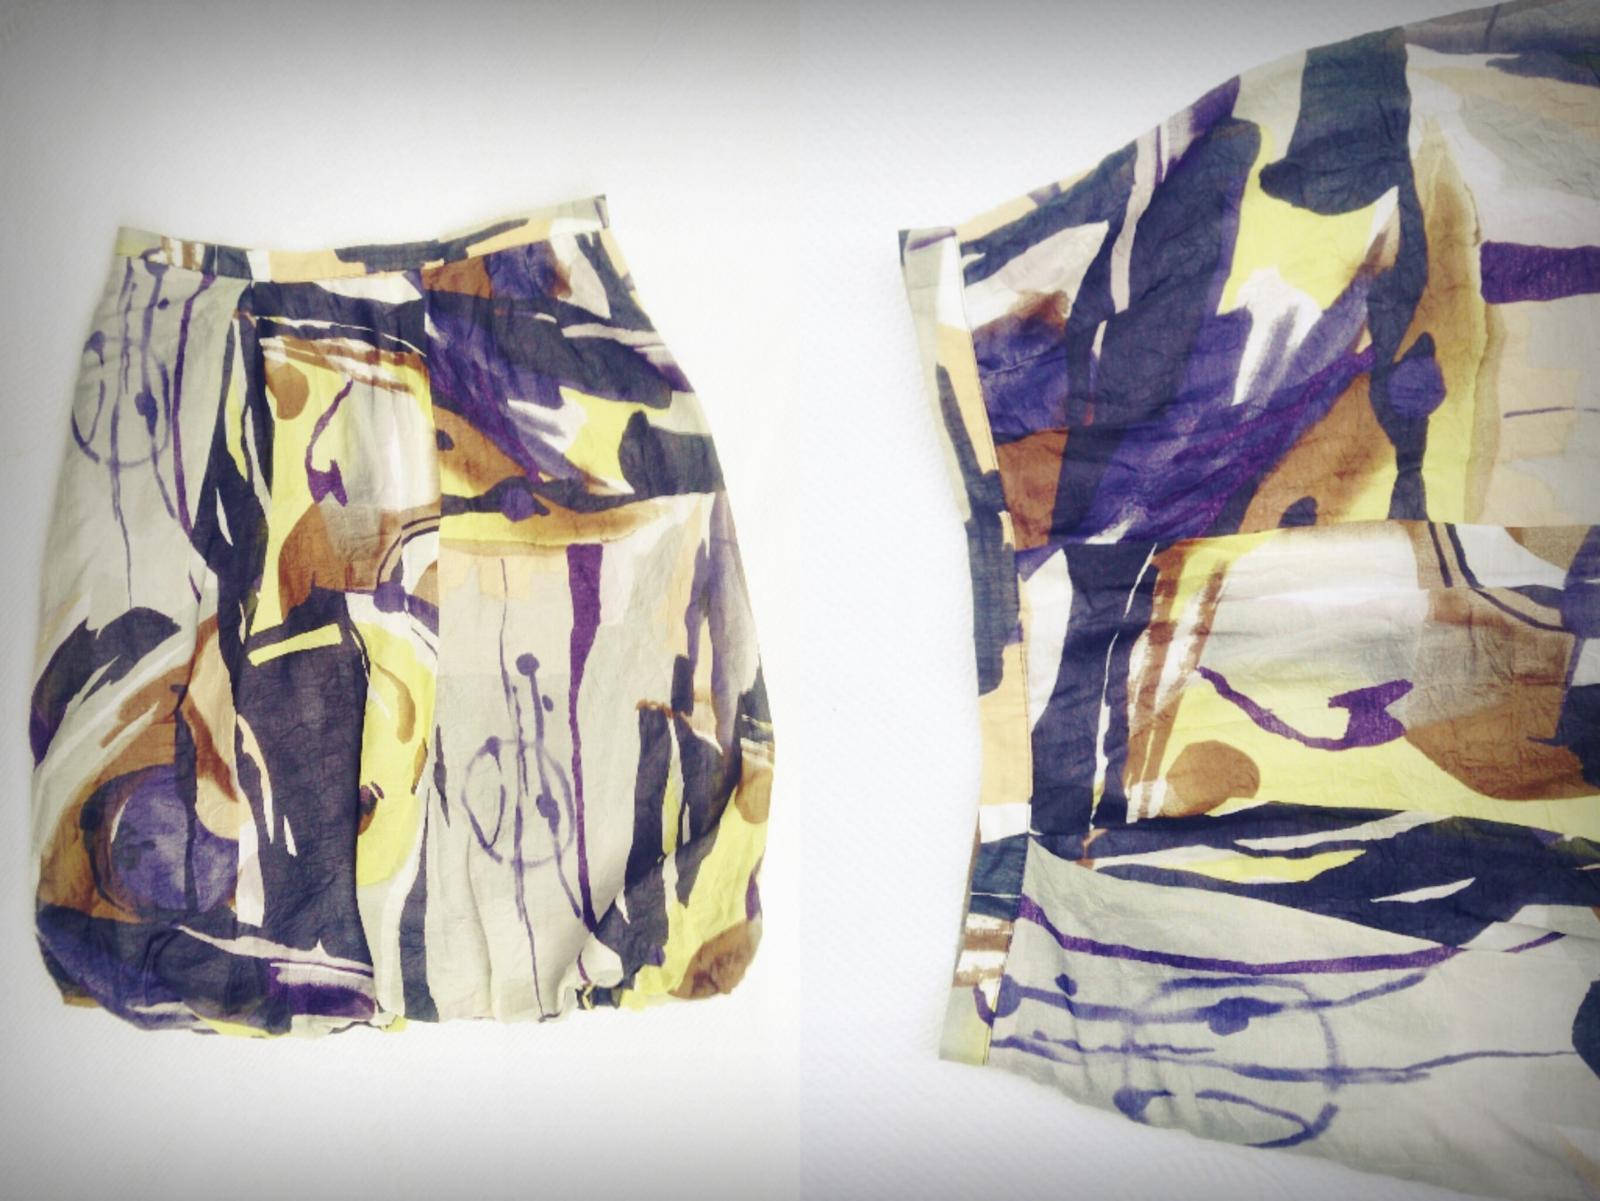 Hirsch akvarelová hodvábna sukňa - Obrázok č. 1